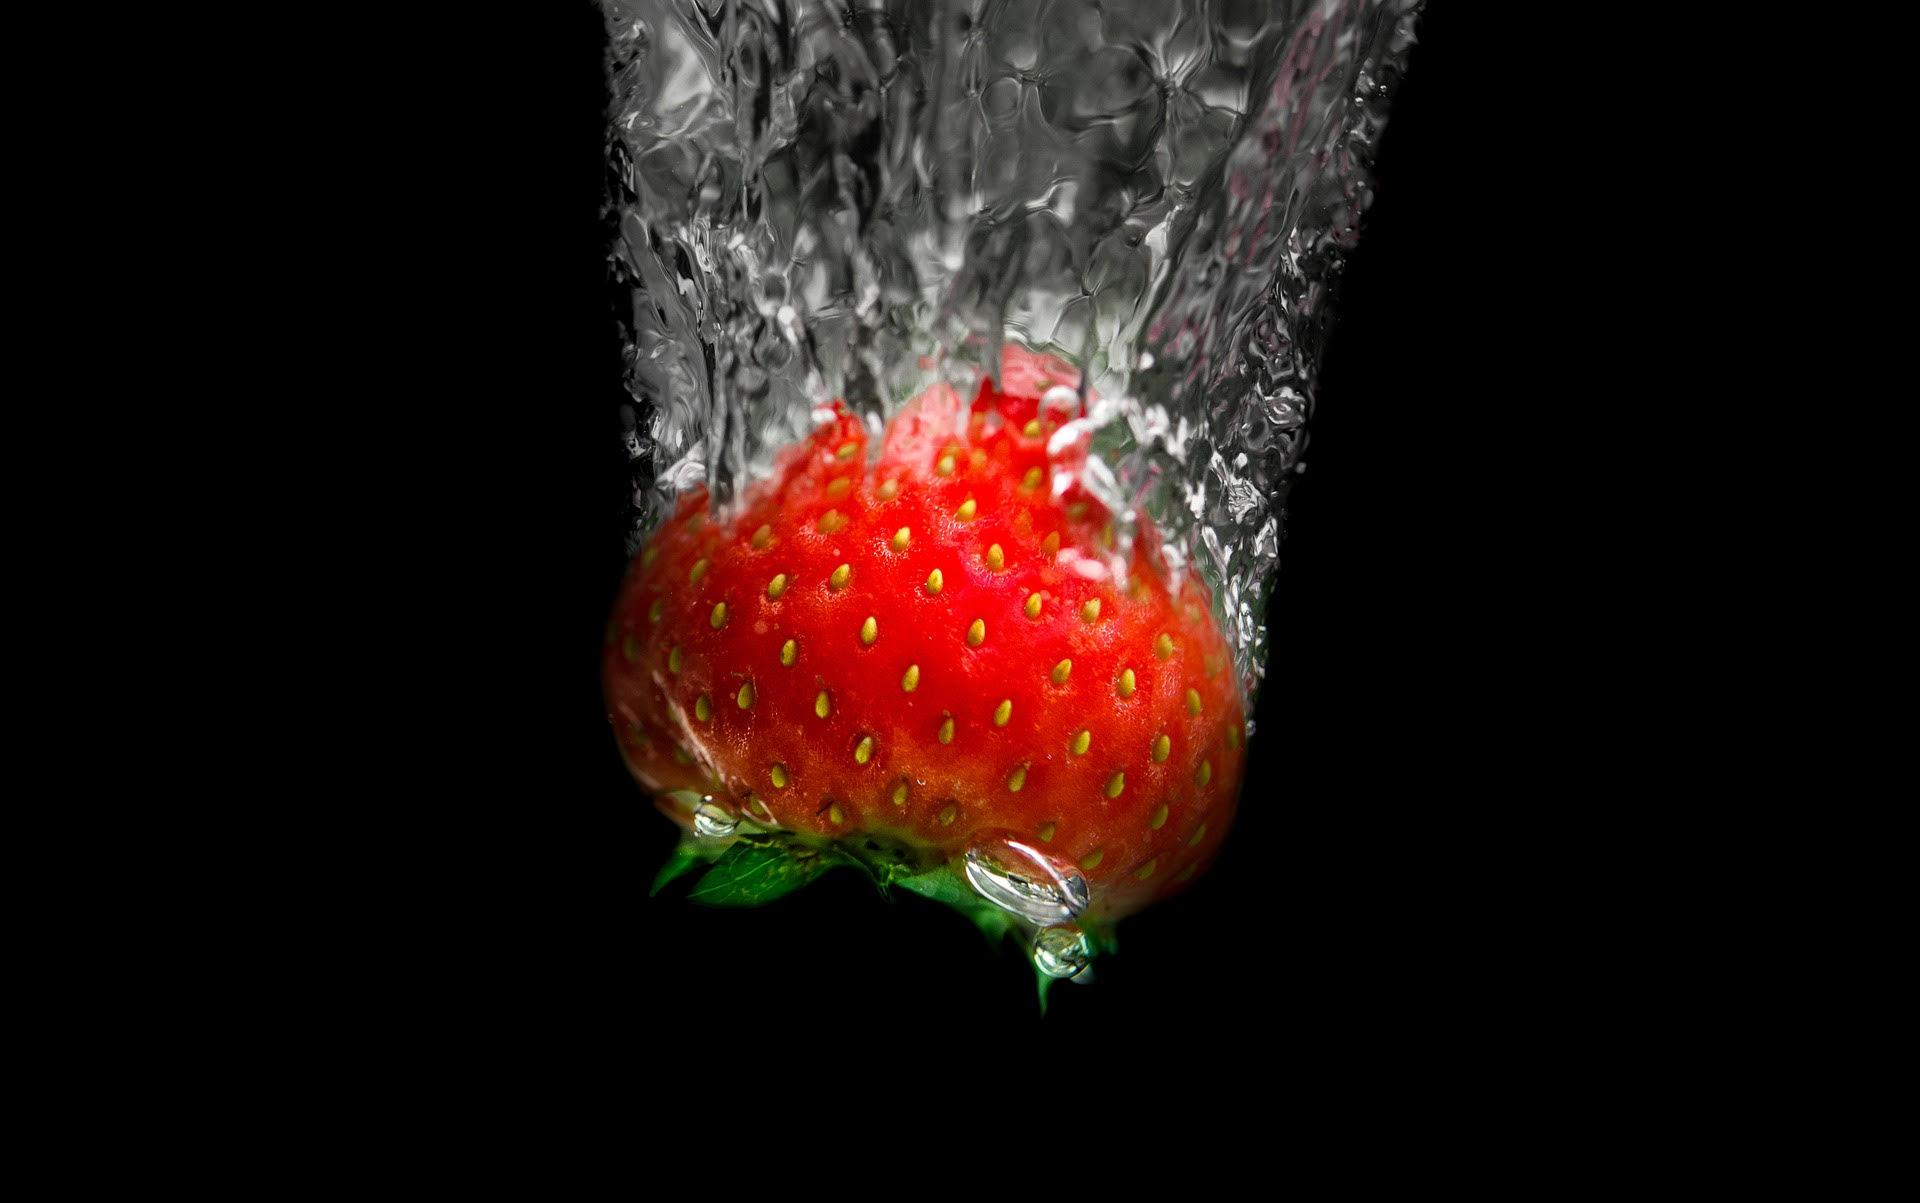 Fruity water splash photography